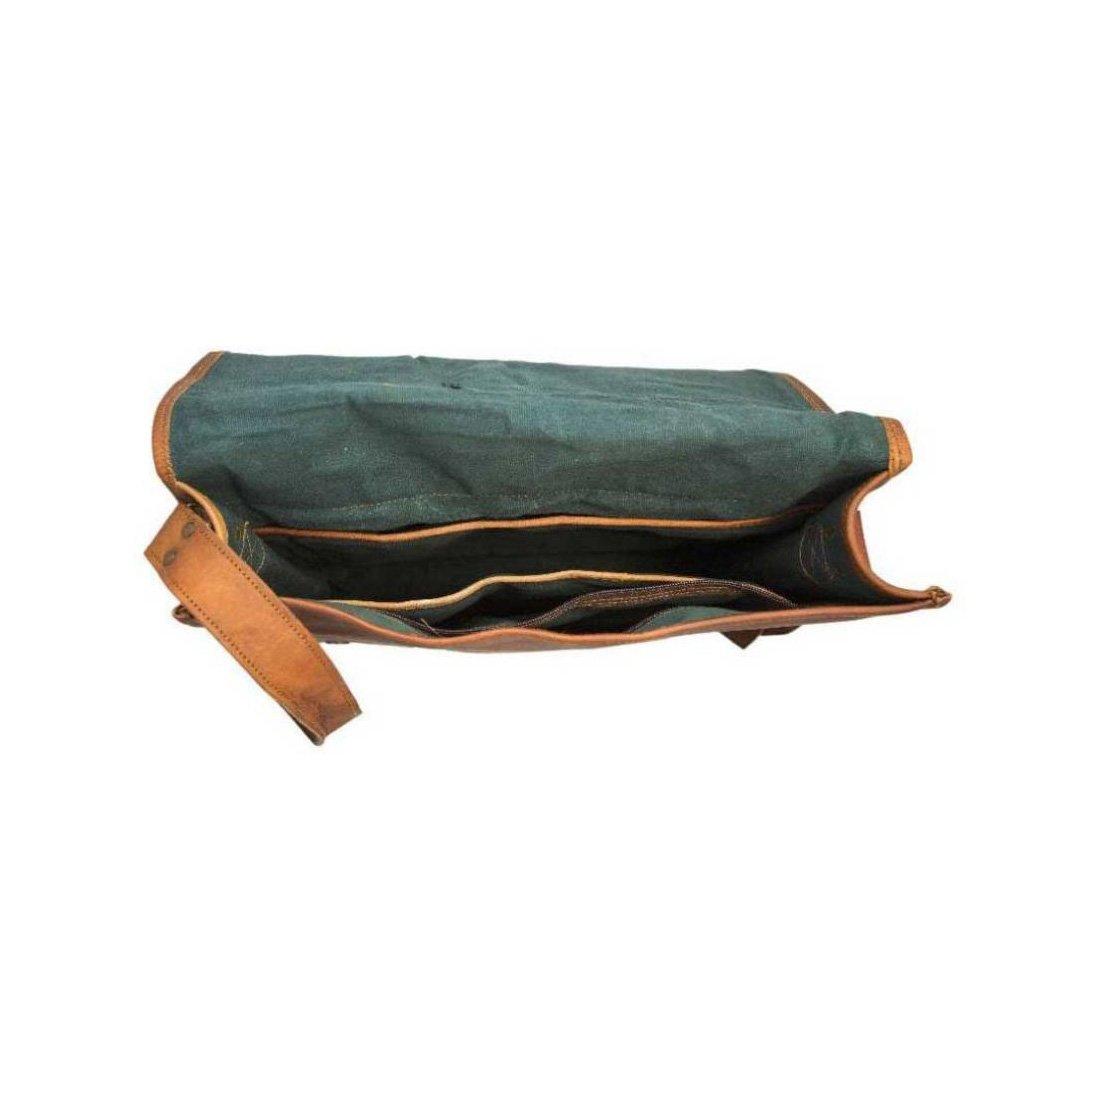 Full Flap Laptop Bag 15x11 inches IHK 2001 iHandikart Handicrafts Handmade Vintage Leather Messenger Bag